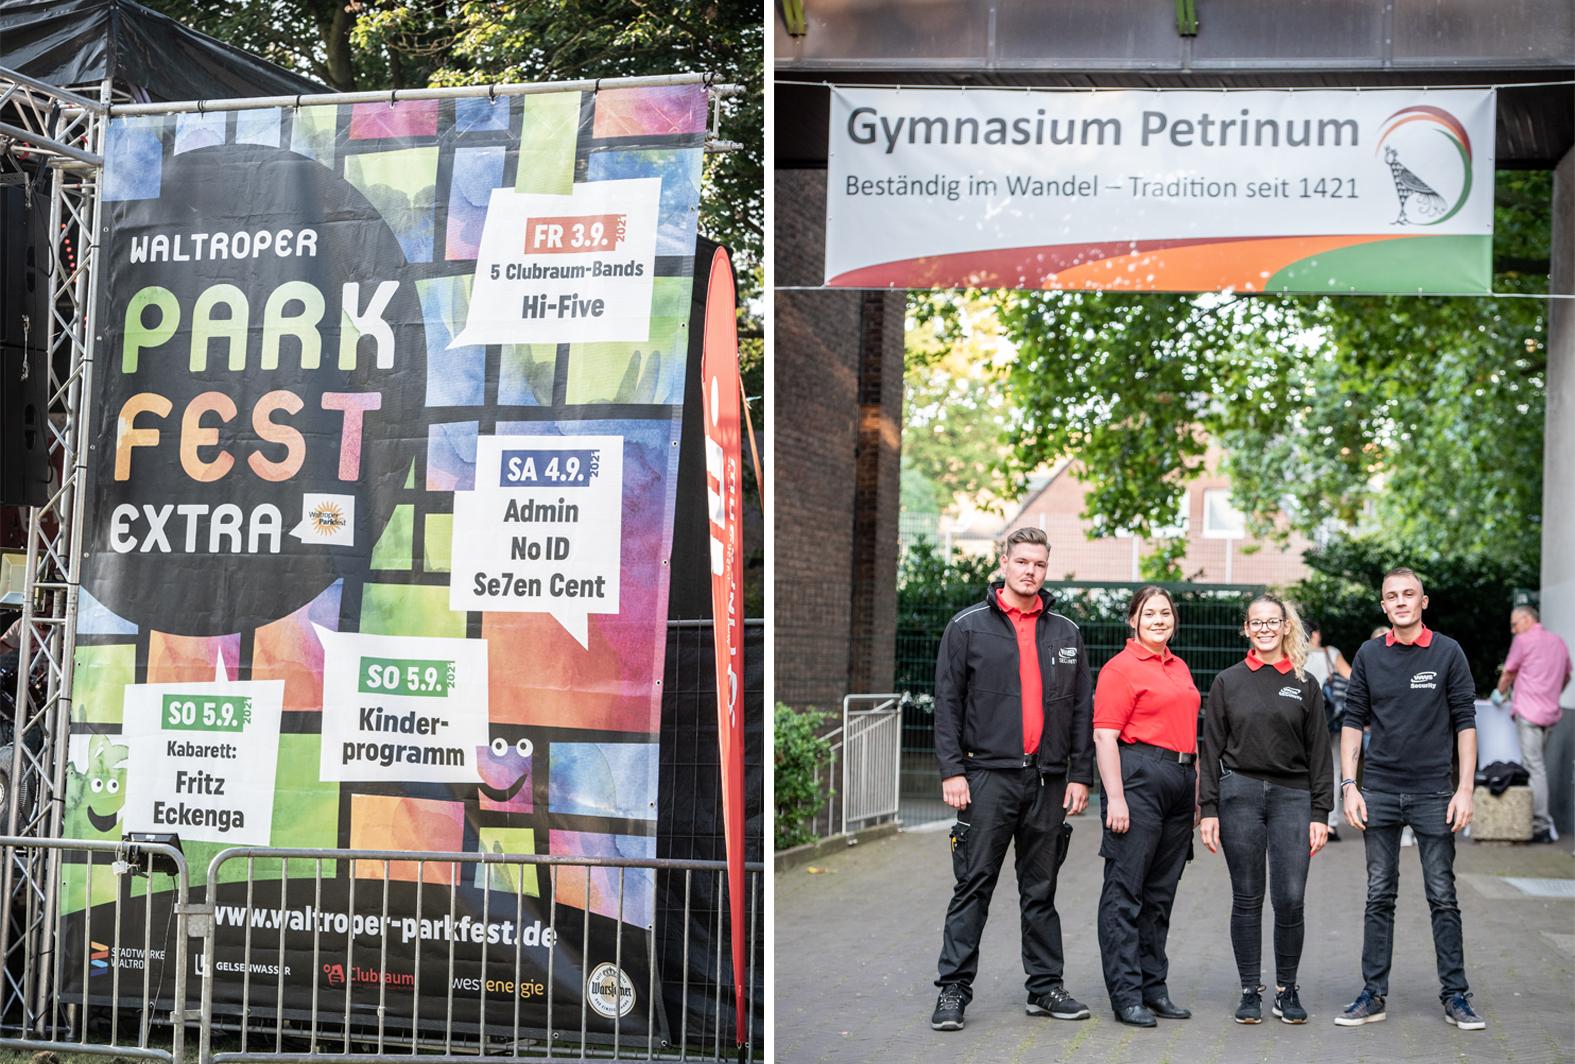 Waltroper Parkfest Extra/ Petrinum 600 Jahre Jubiläum